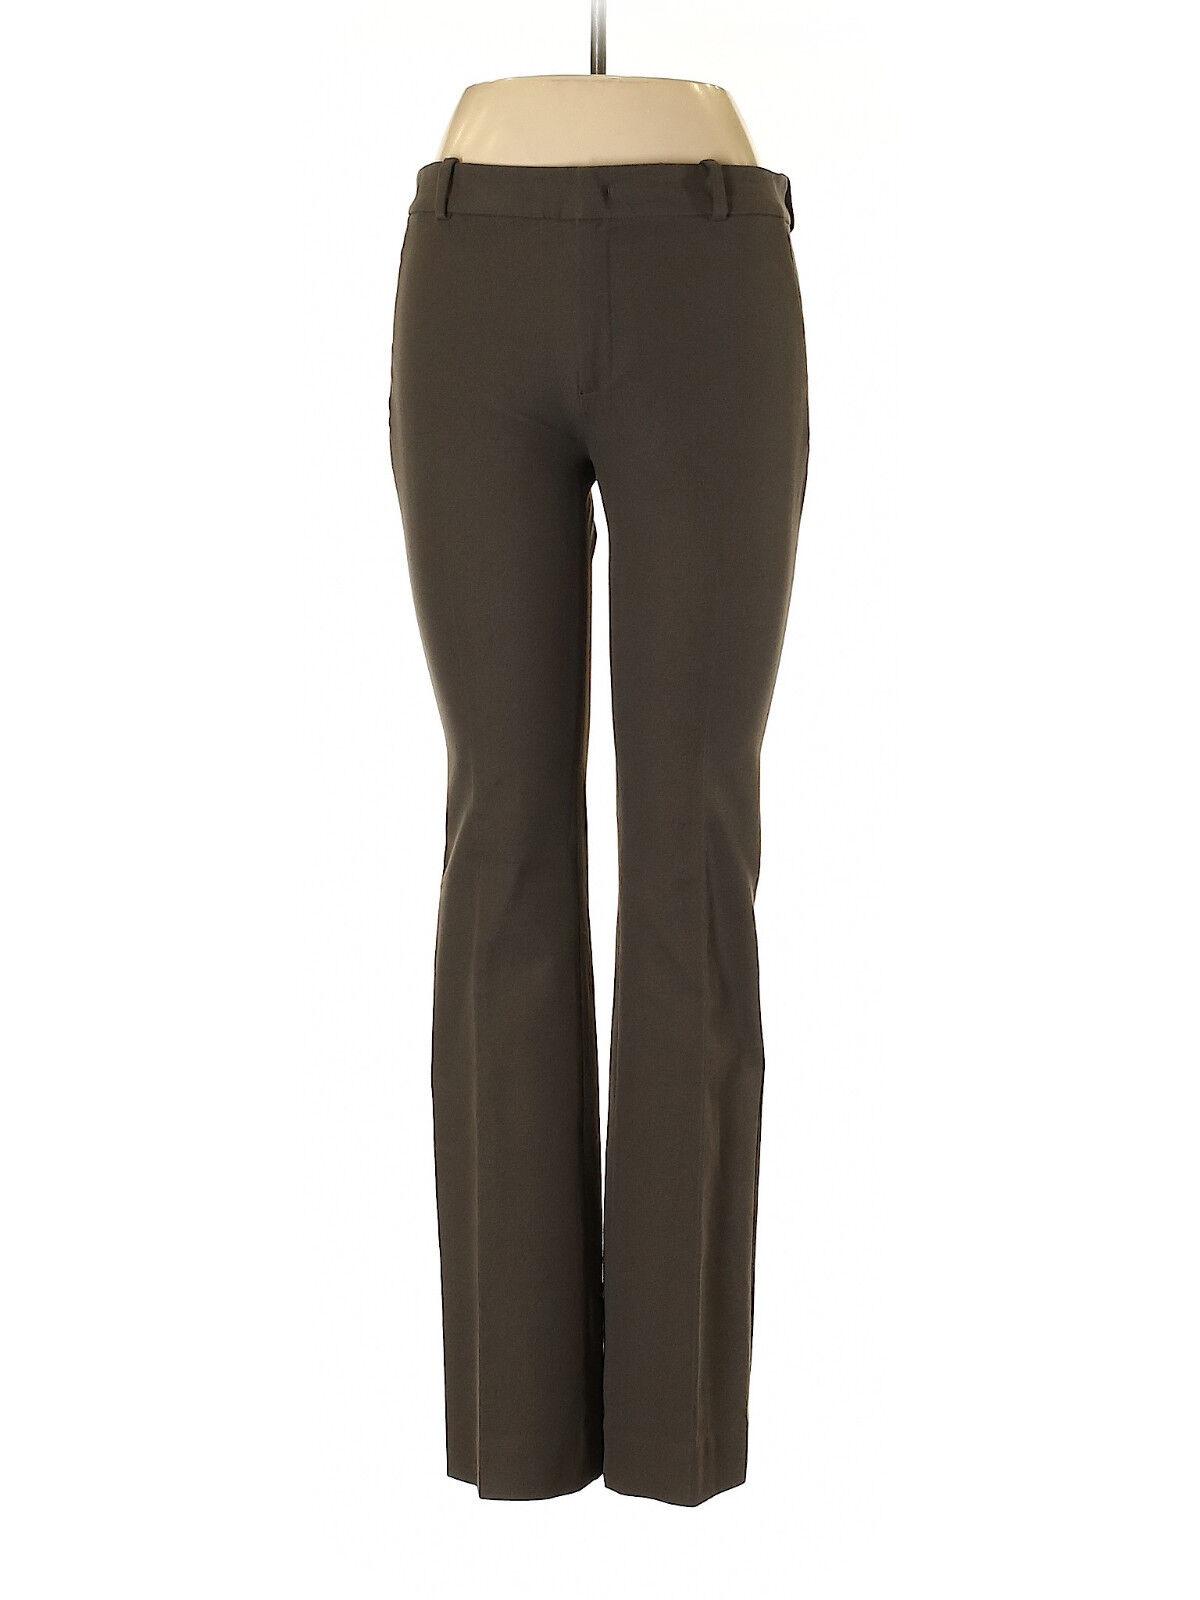 Joseph Grey Designer Dress Pants sz Euro 38 US 4 6